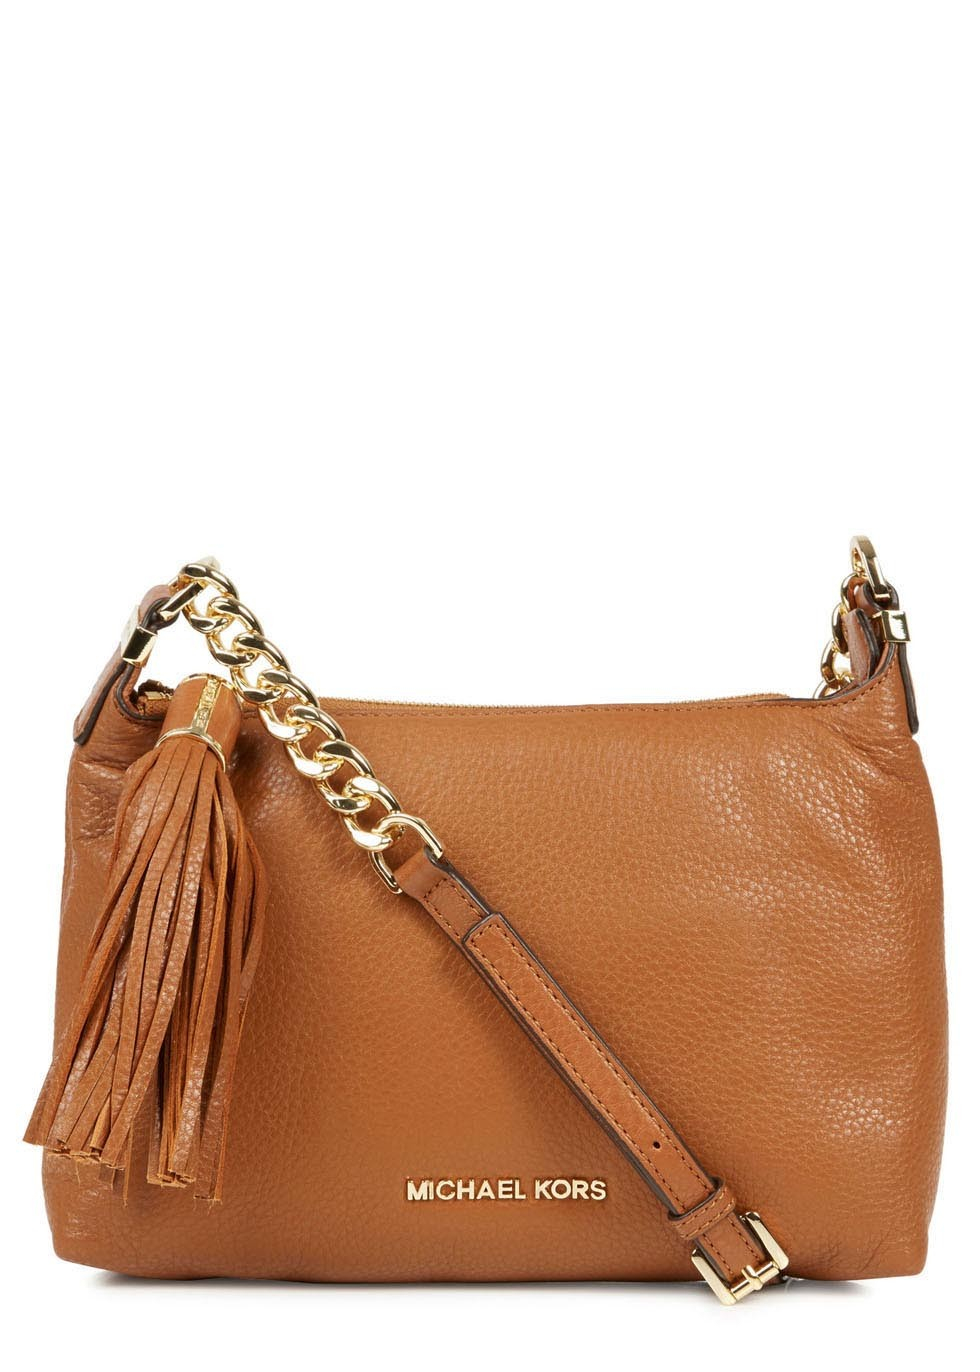 c0c824026050 Michael Kors Weston Tan Grained Leather Crossbody Bag in Brown - Lyst